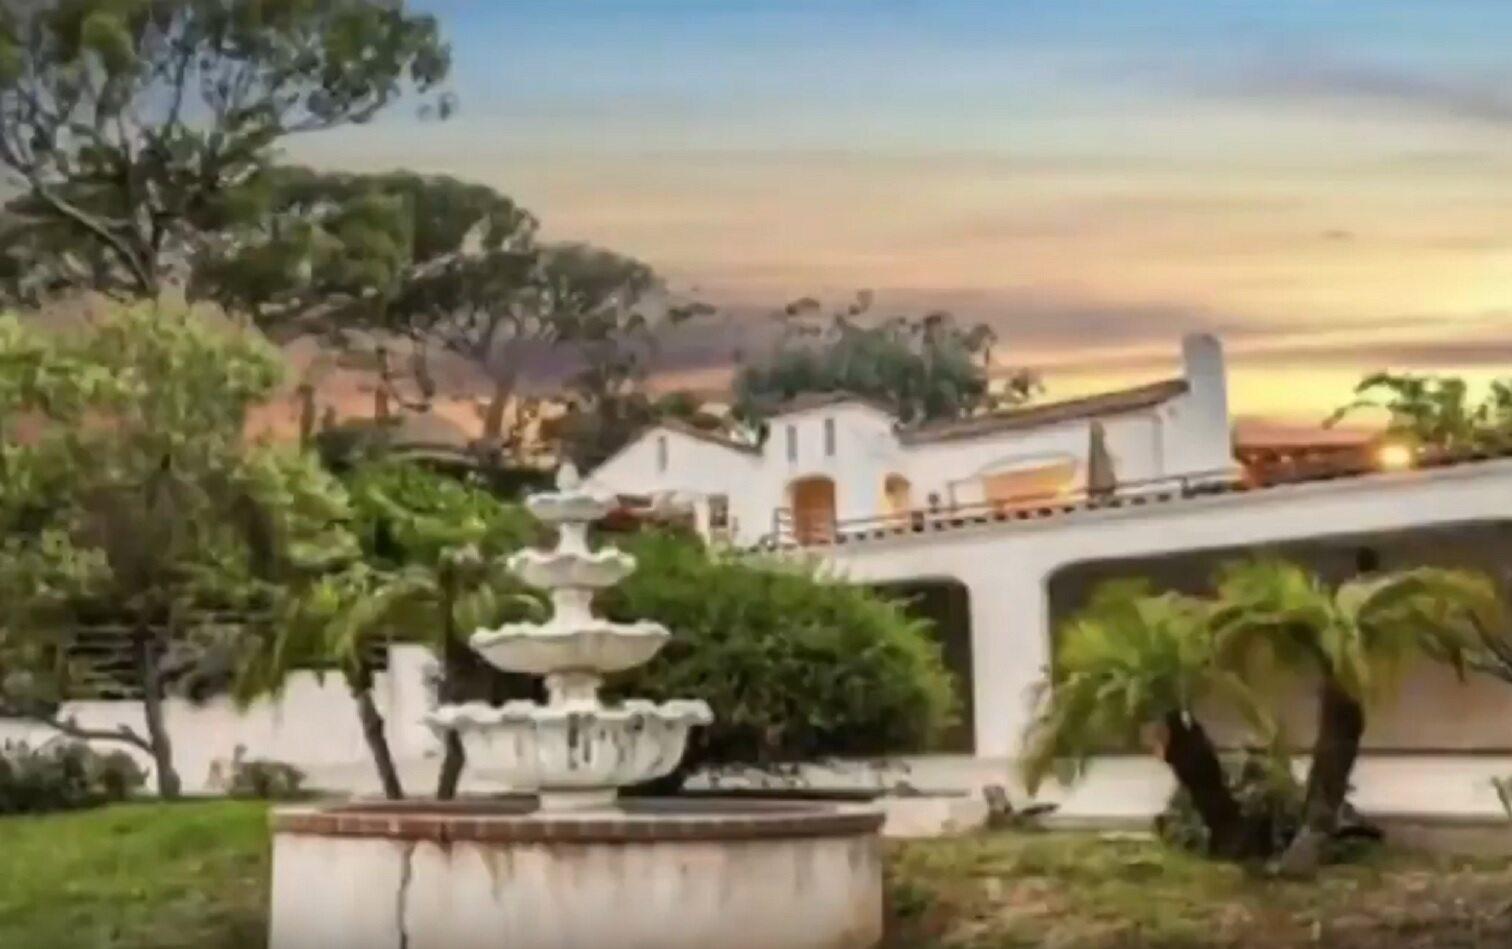 Dom w Los Feliz – okolicy Los Angeles